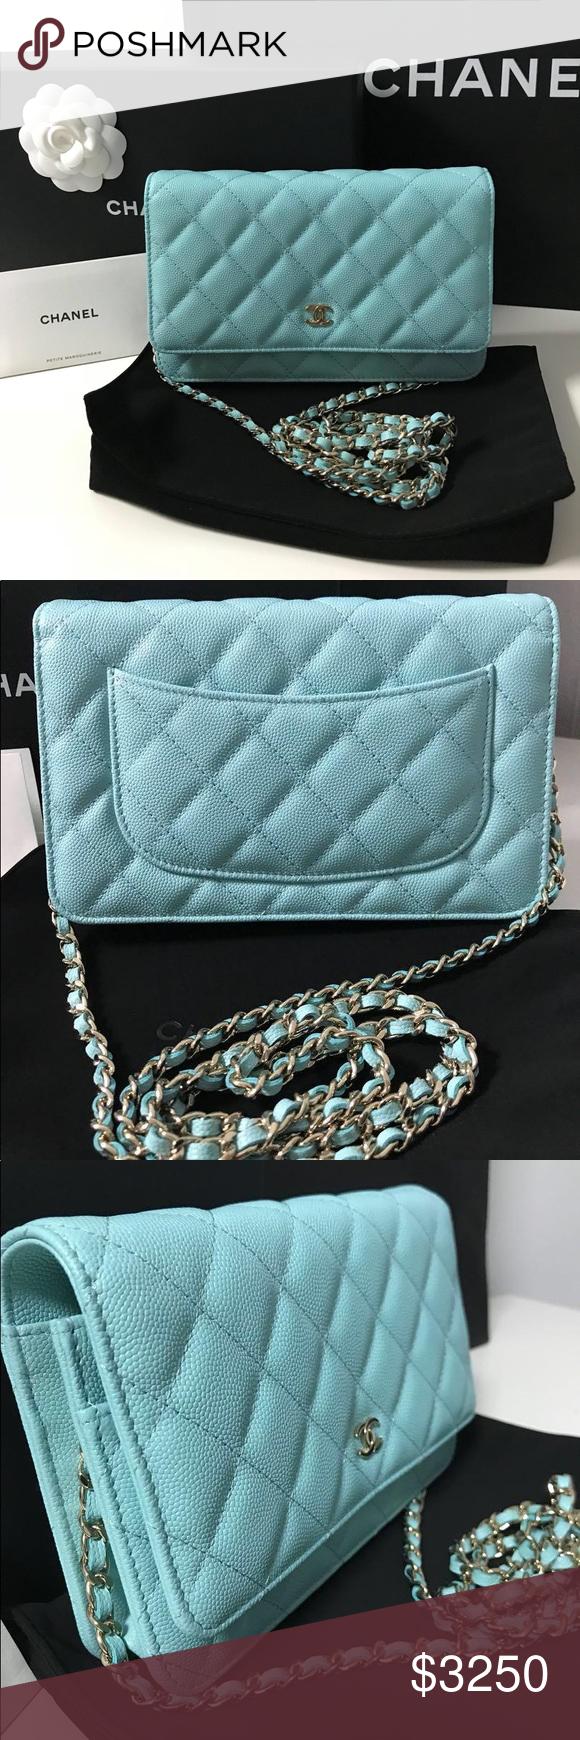 929774fd8ce3 Chanel 19C WOC Wallet On Chain Blue Caviar Leather Brand New Chanel Wallet  On Chain WOC